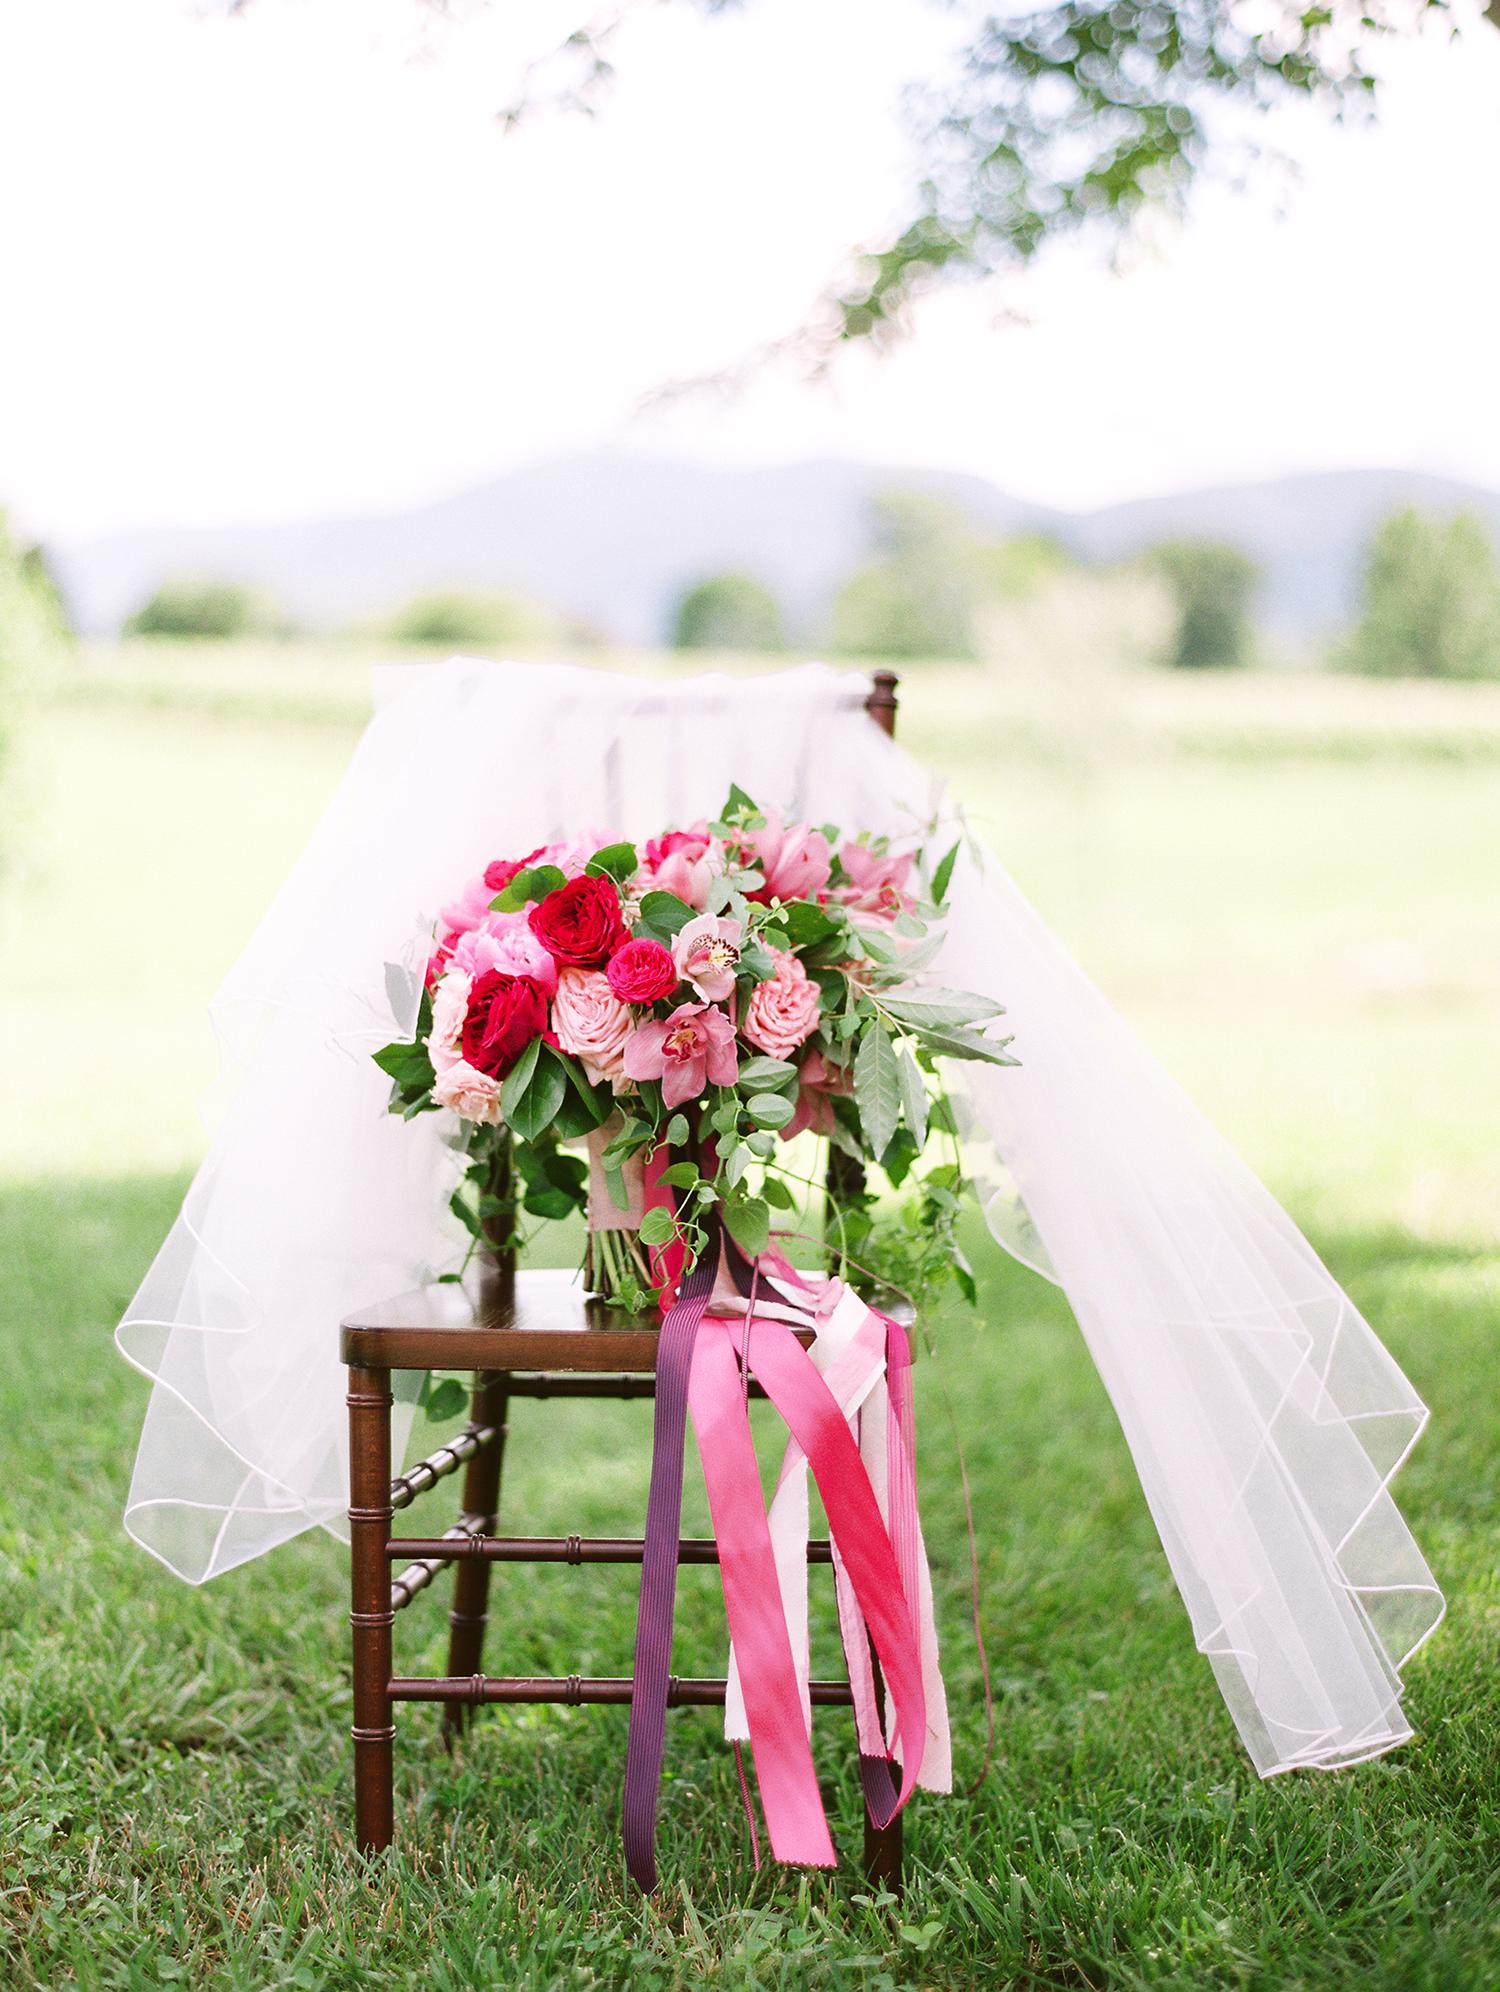 dawn rich wedding pink bouquet on chair in the grass